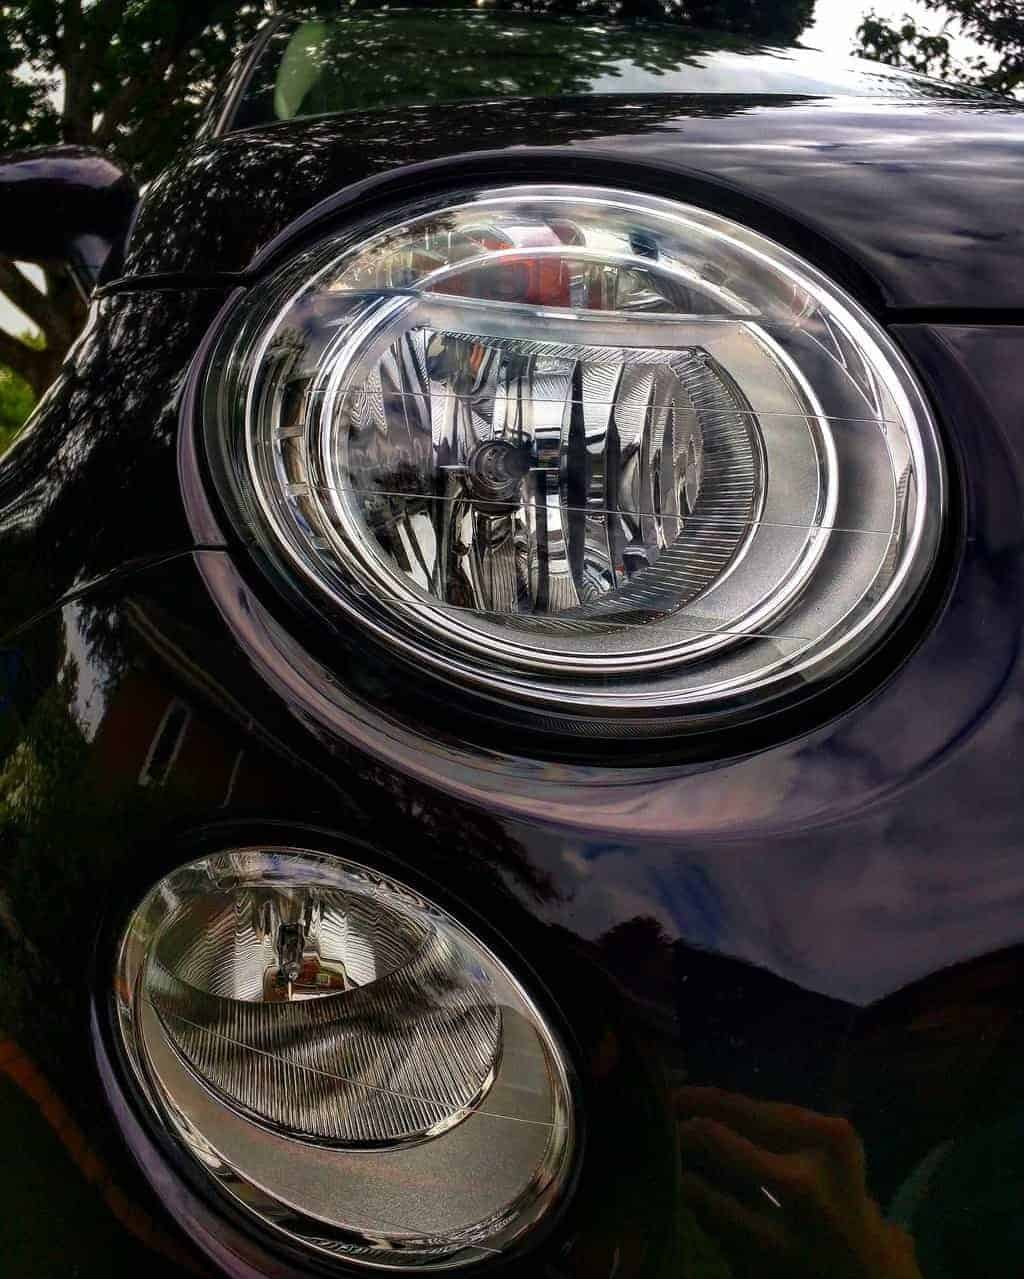 Close up of a car's projector headlights